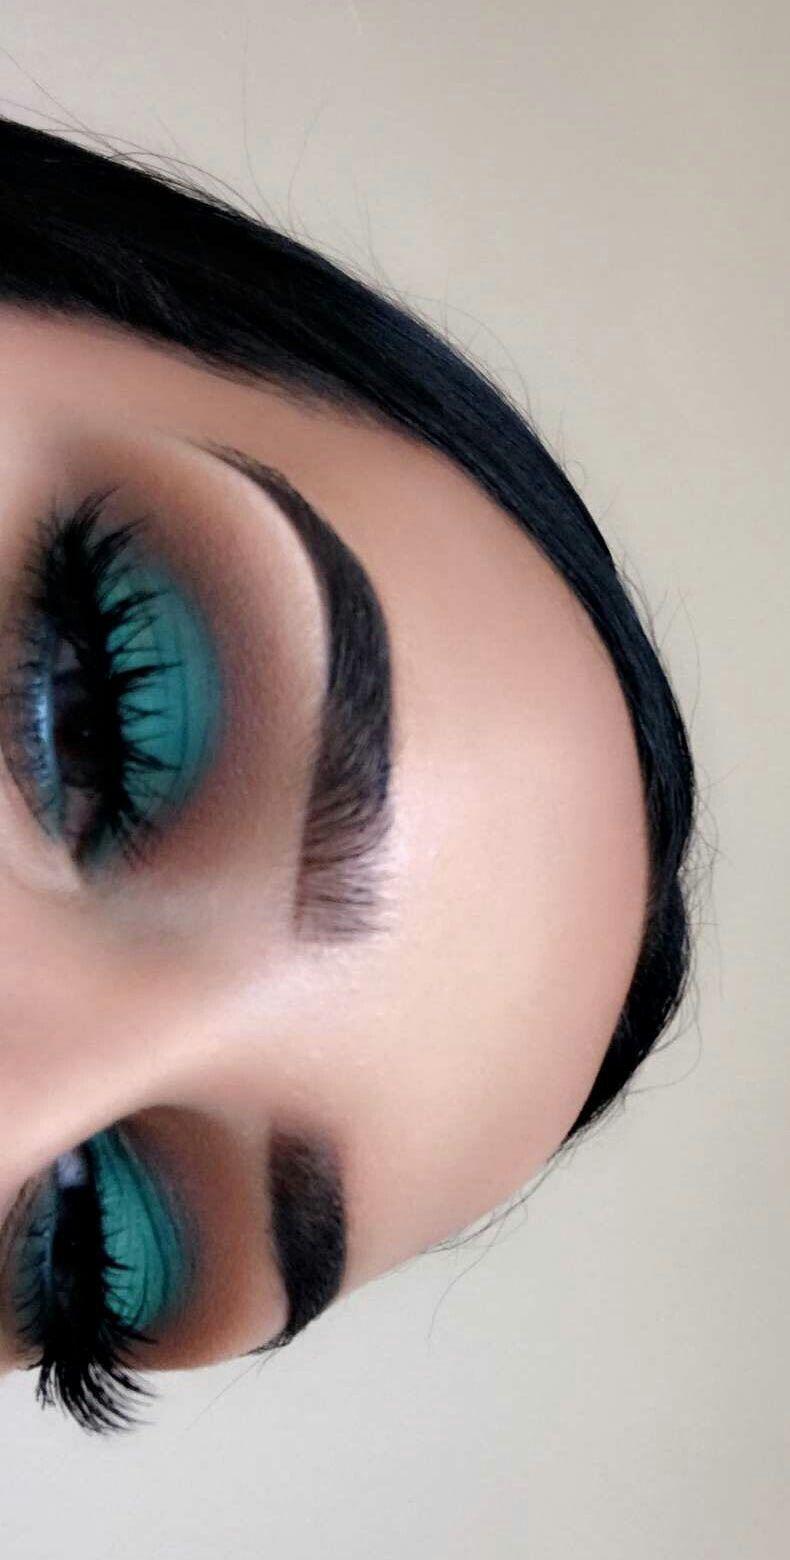 pinterest|@lauraspinsxoxo ✨ | peacock eye makeup, dramatic